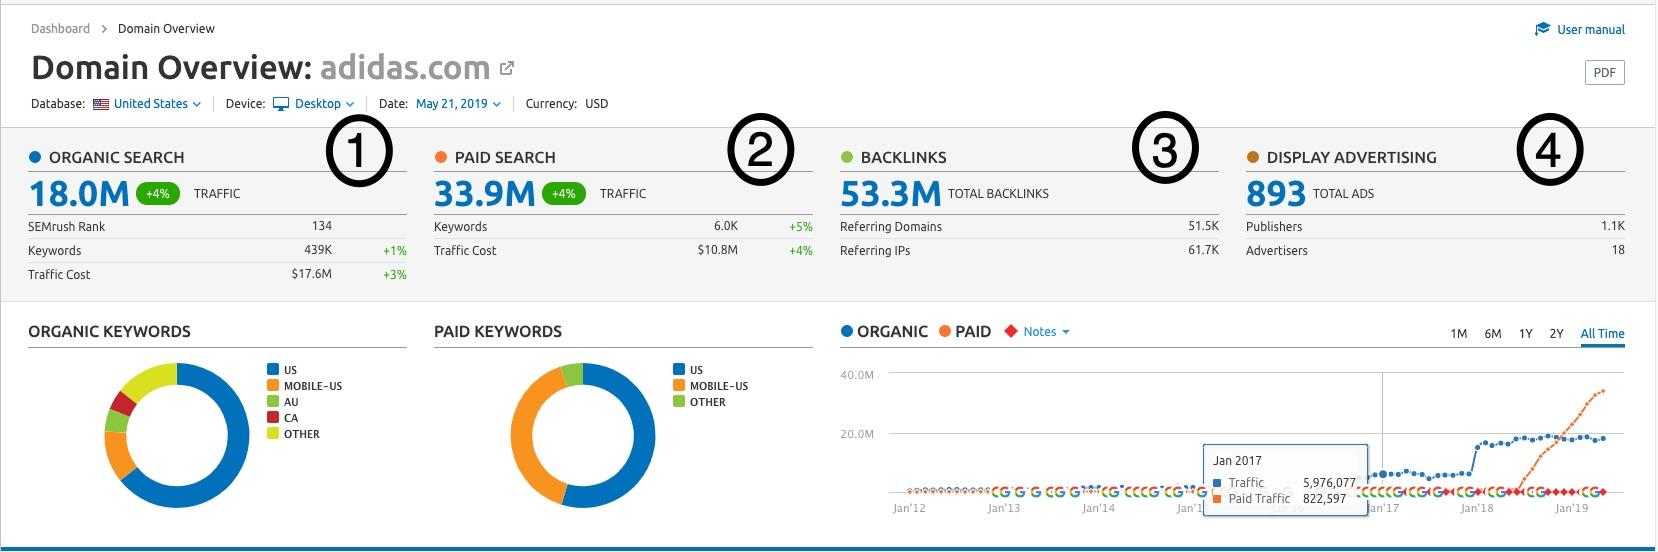 Domain Overview - Desktop image 1